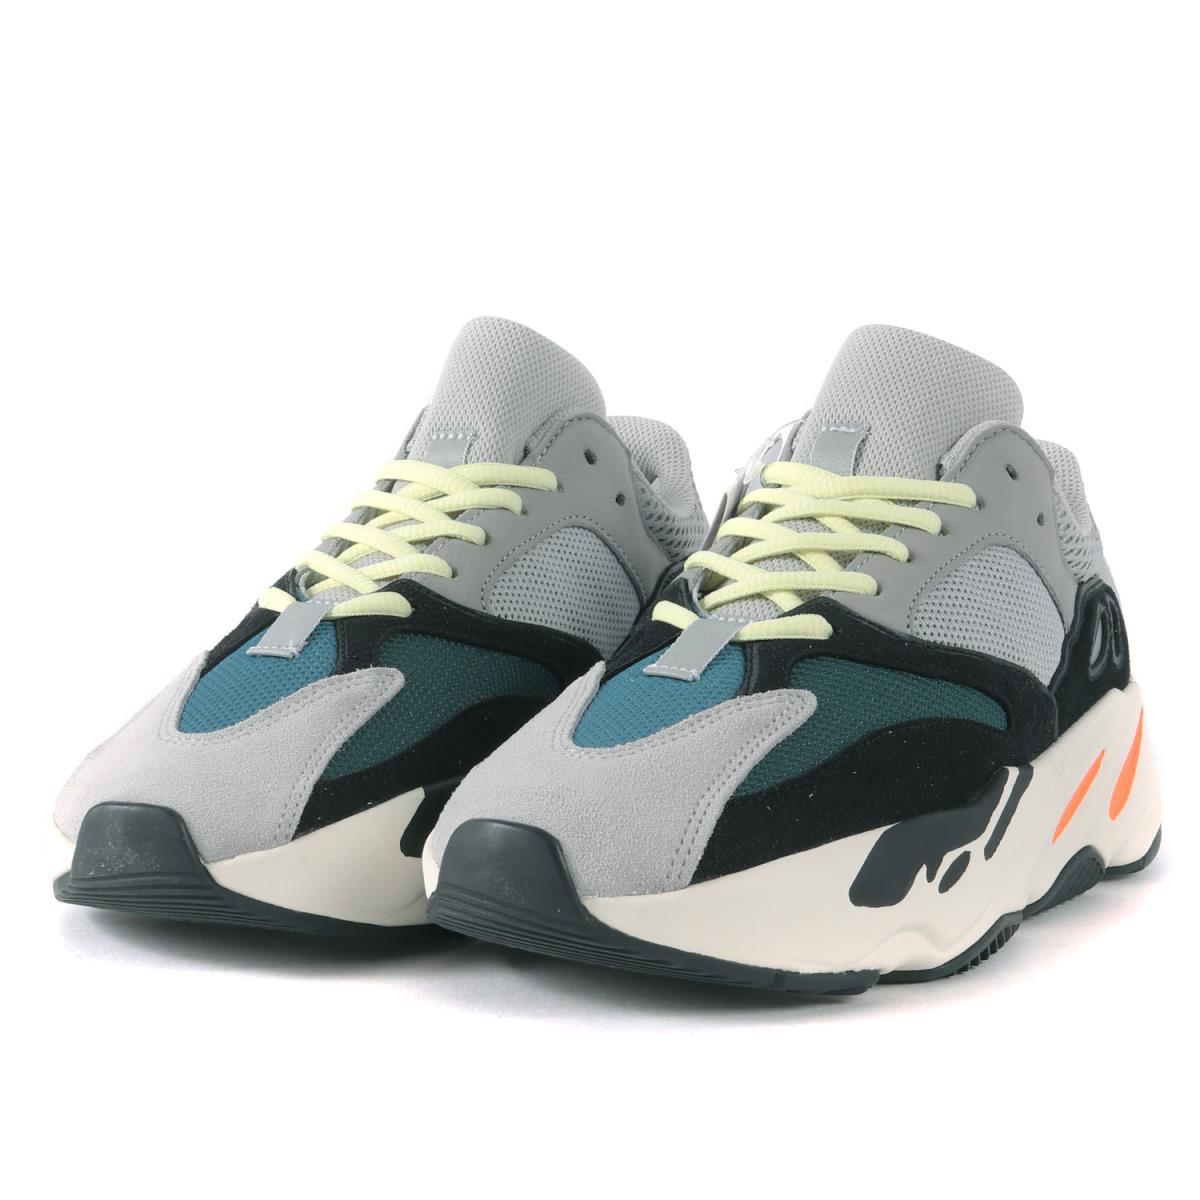 adidas Adidas YEEZY BOOST 700 WAVE RUNNER B75571 gray X white X black US8(26cm)